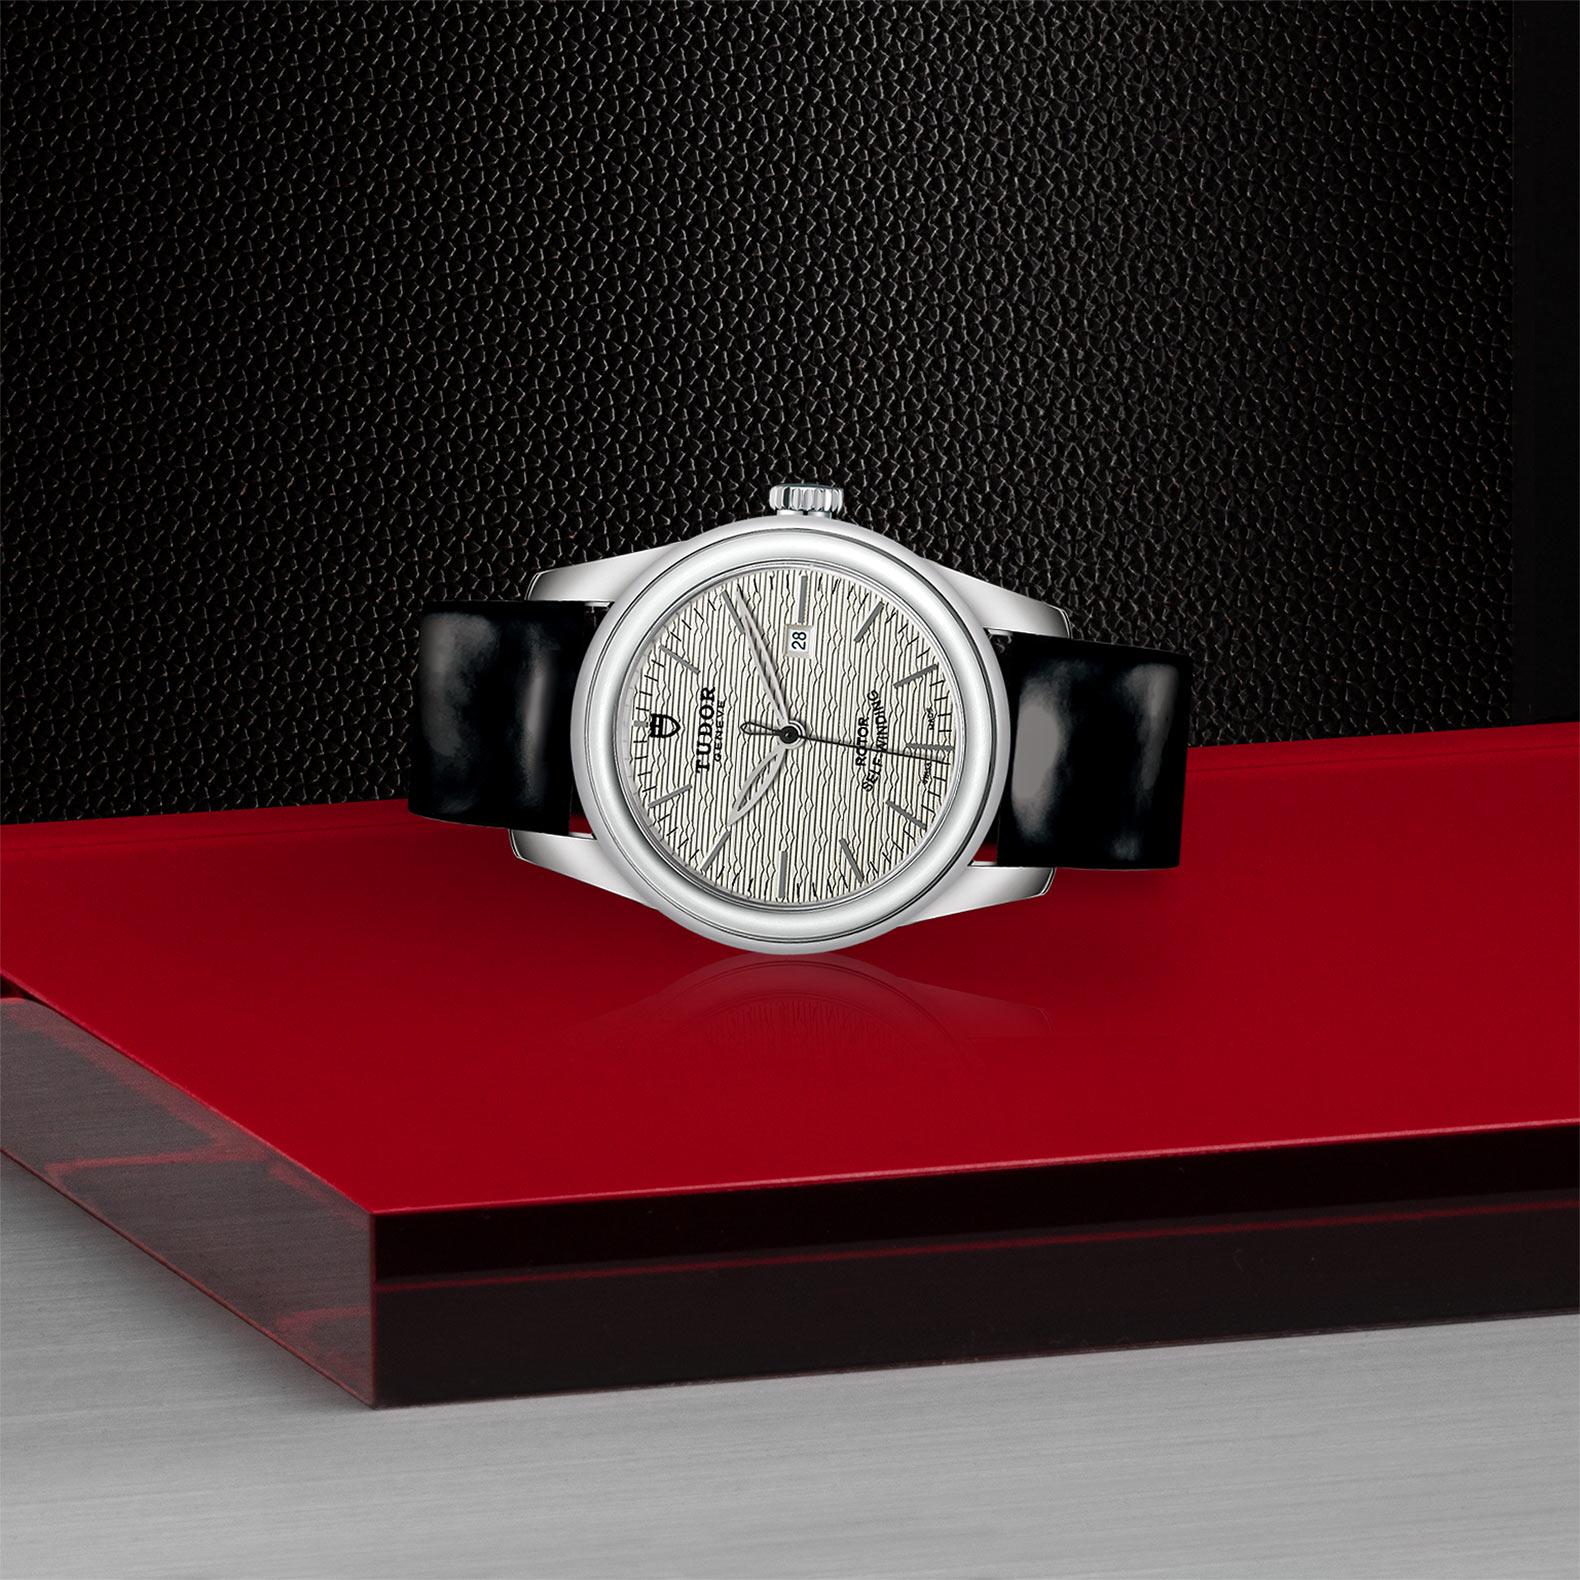 TUDOR Glamour Date - M53000-0015